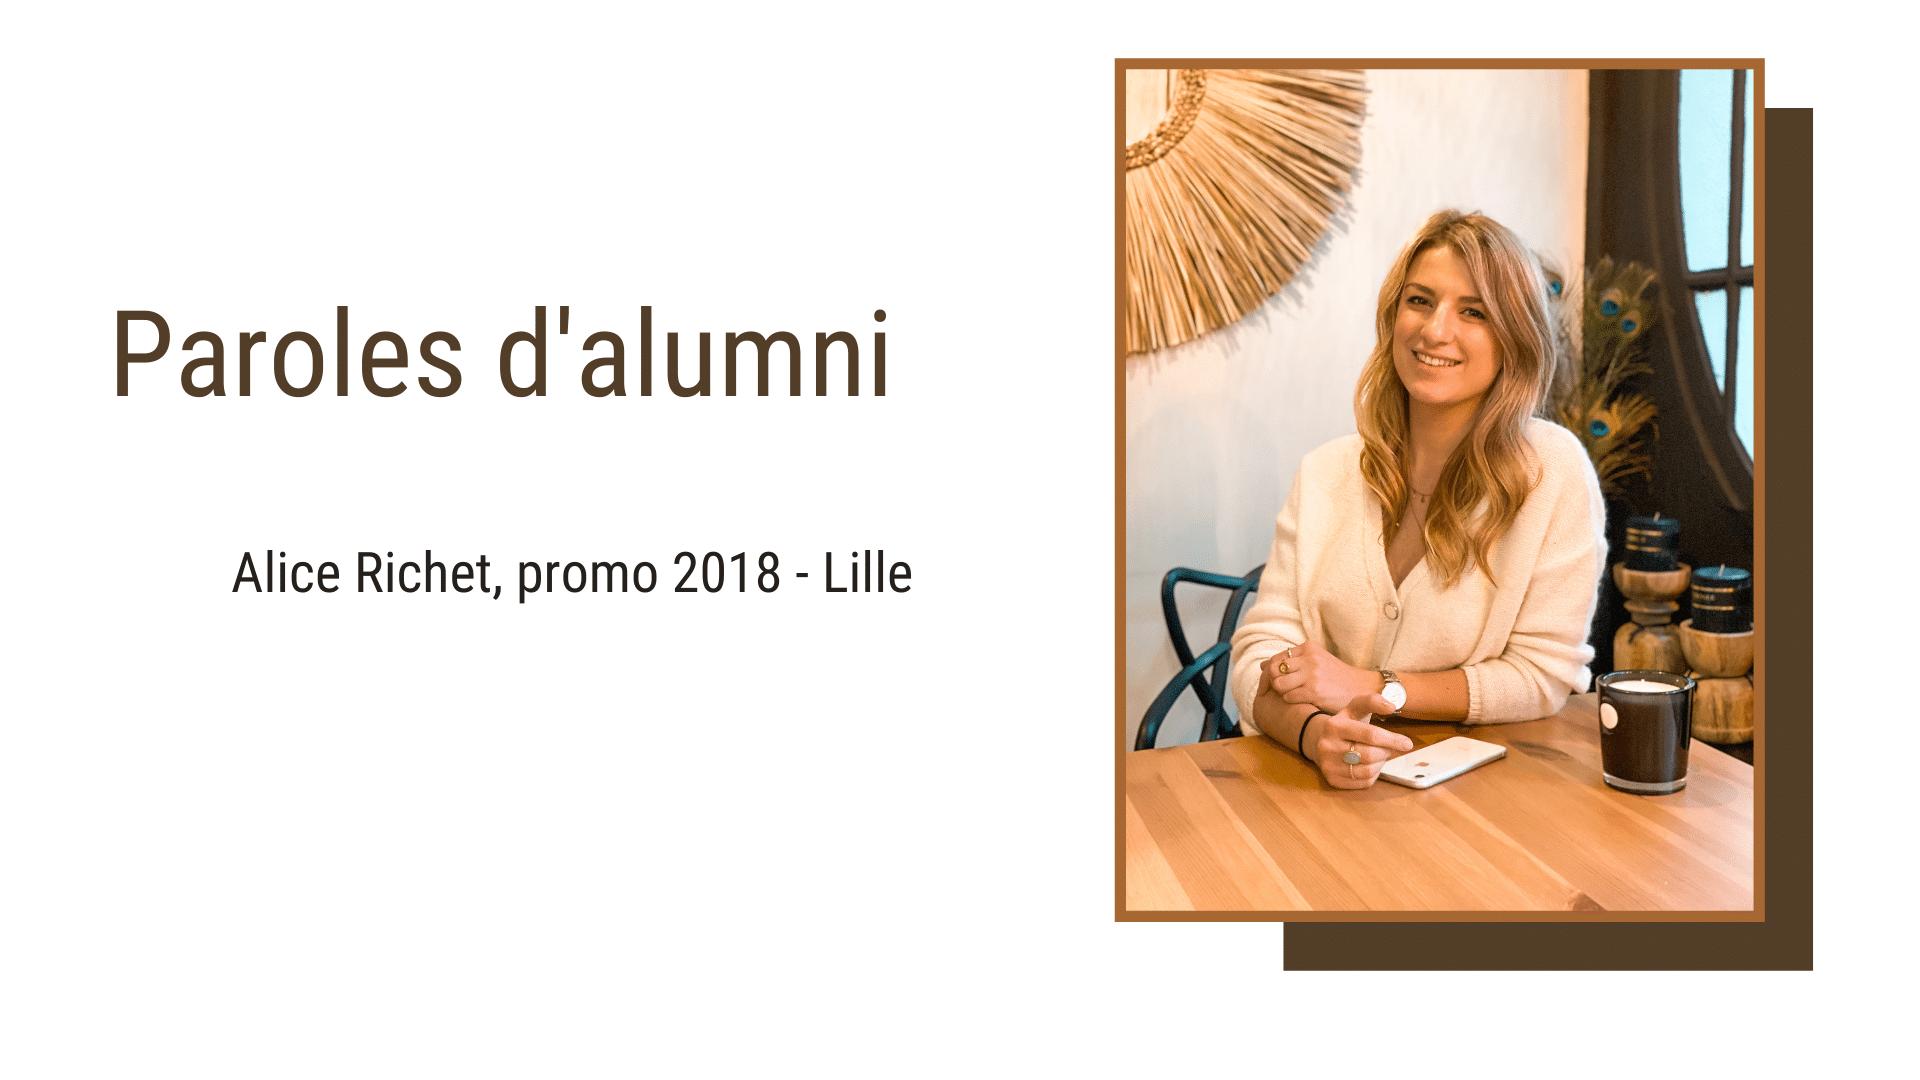 Alumni : rencontre avec Alice Richet, promo 2018